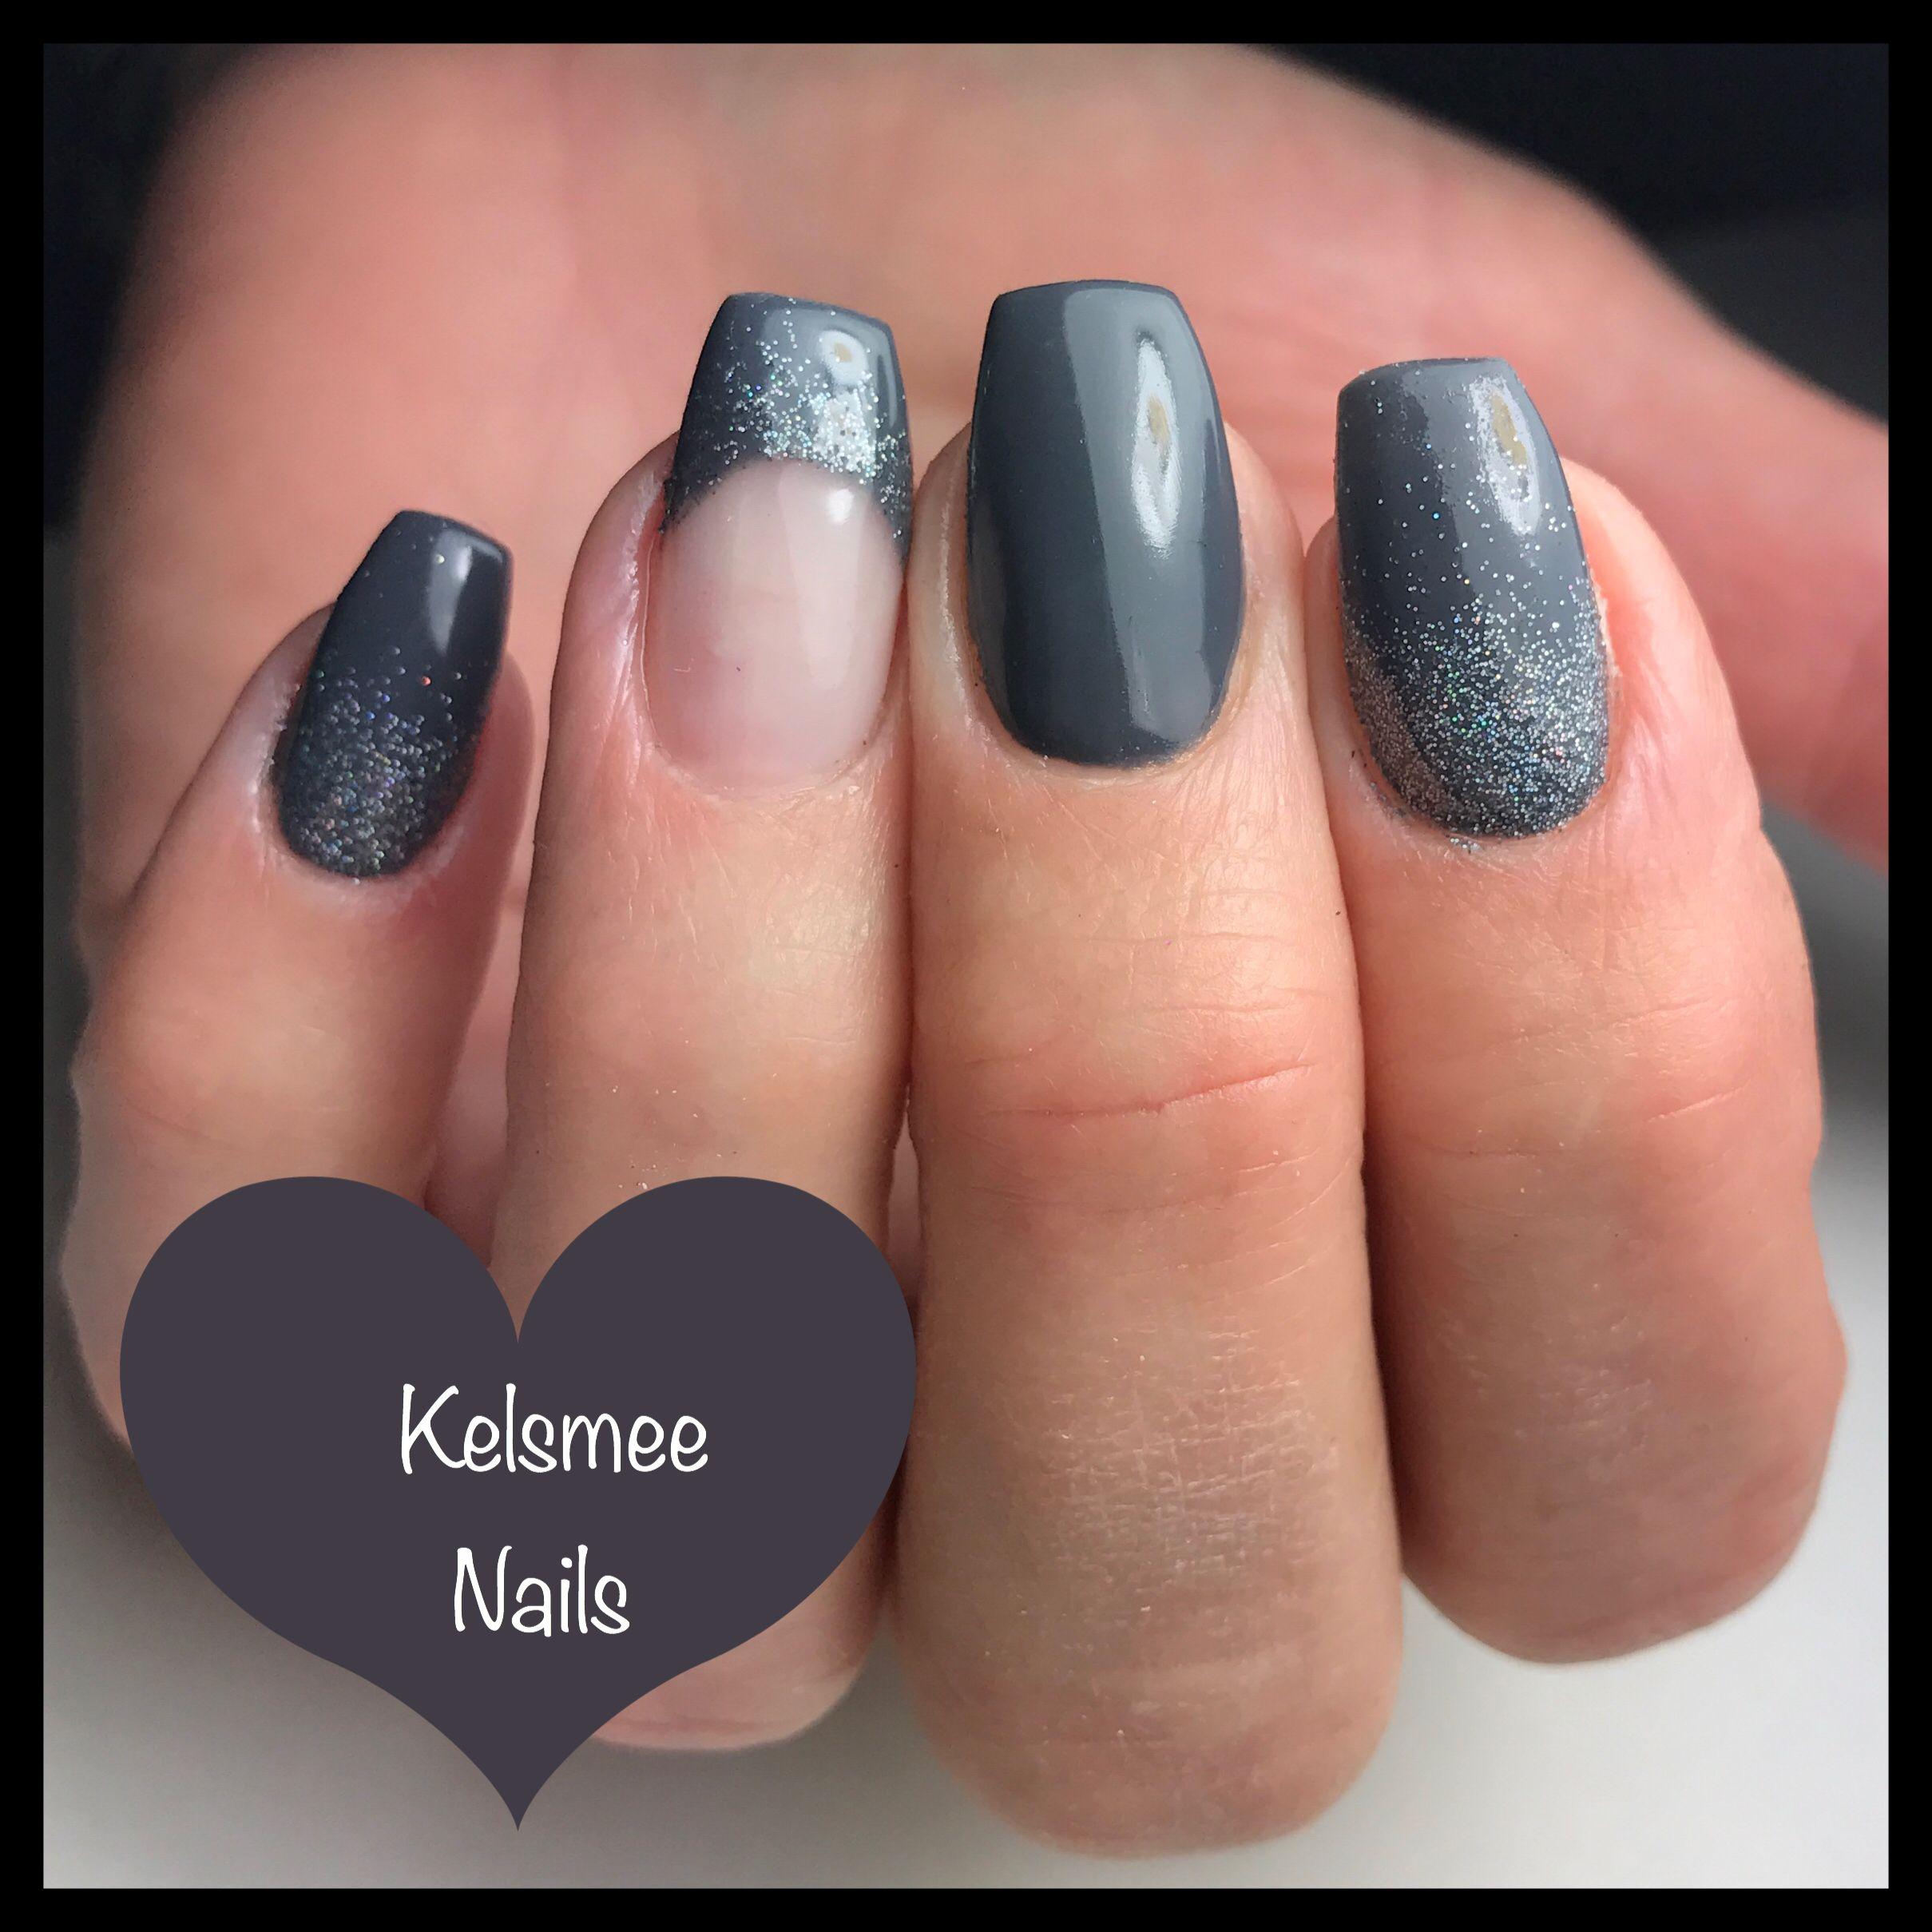 ManiQ Grey with glitterpress and french manicure - Nagels ...